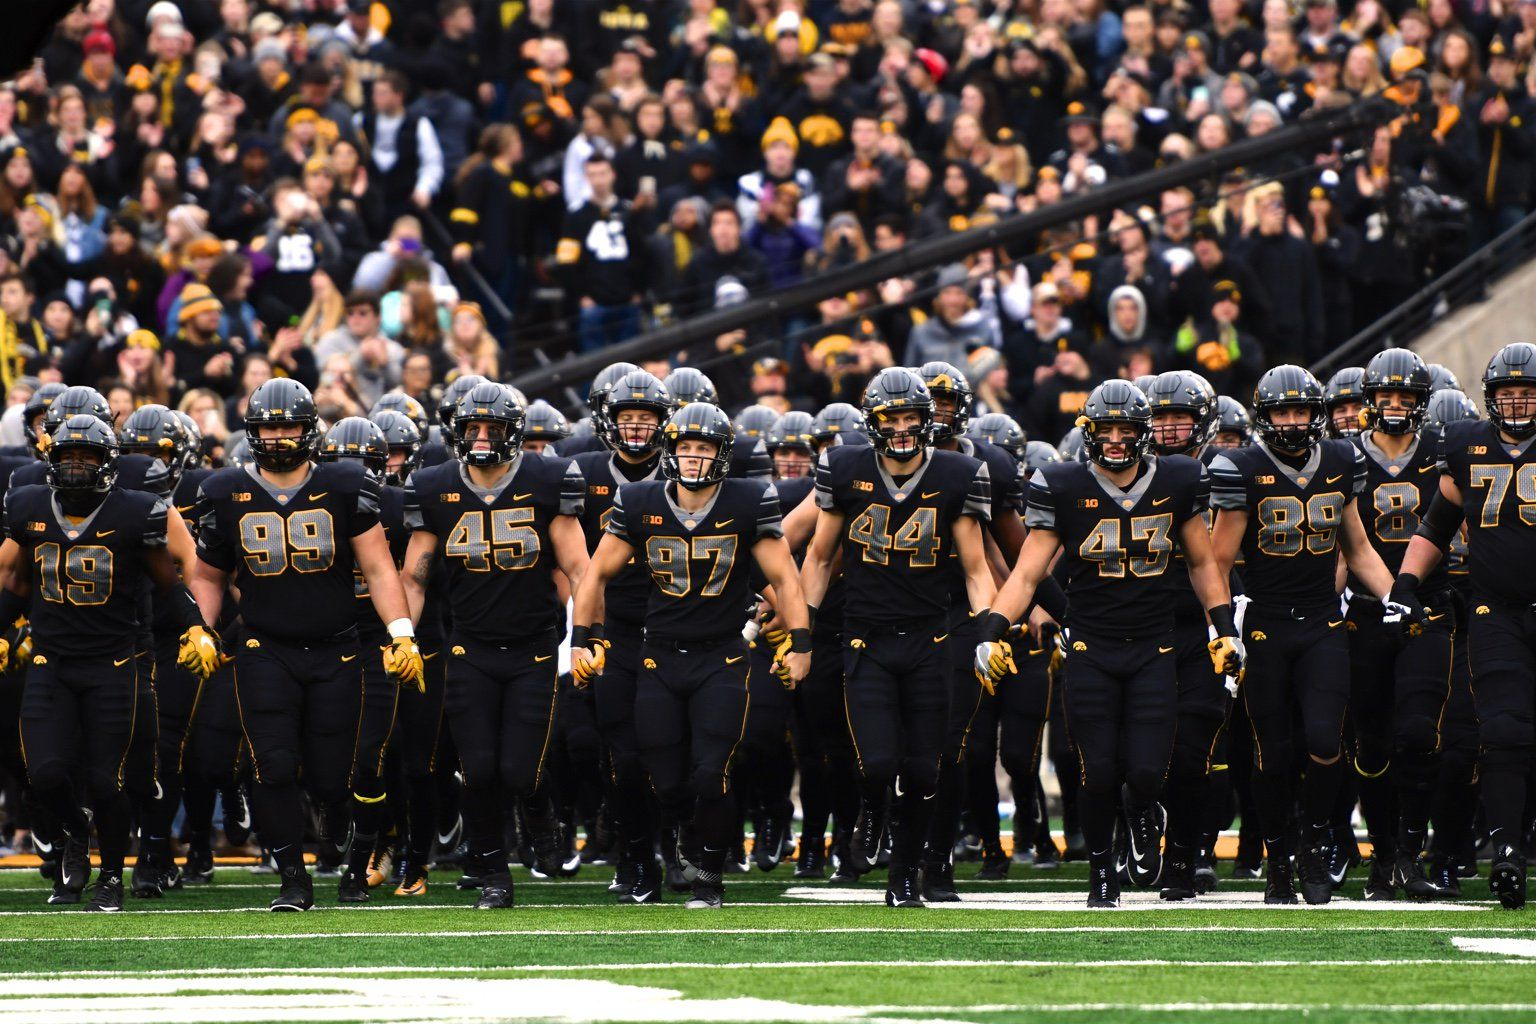 The Iowa Hawkeyes Alternate Uniforms Vs Ohio State Nov 2017